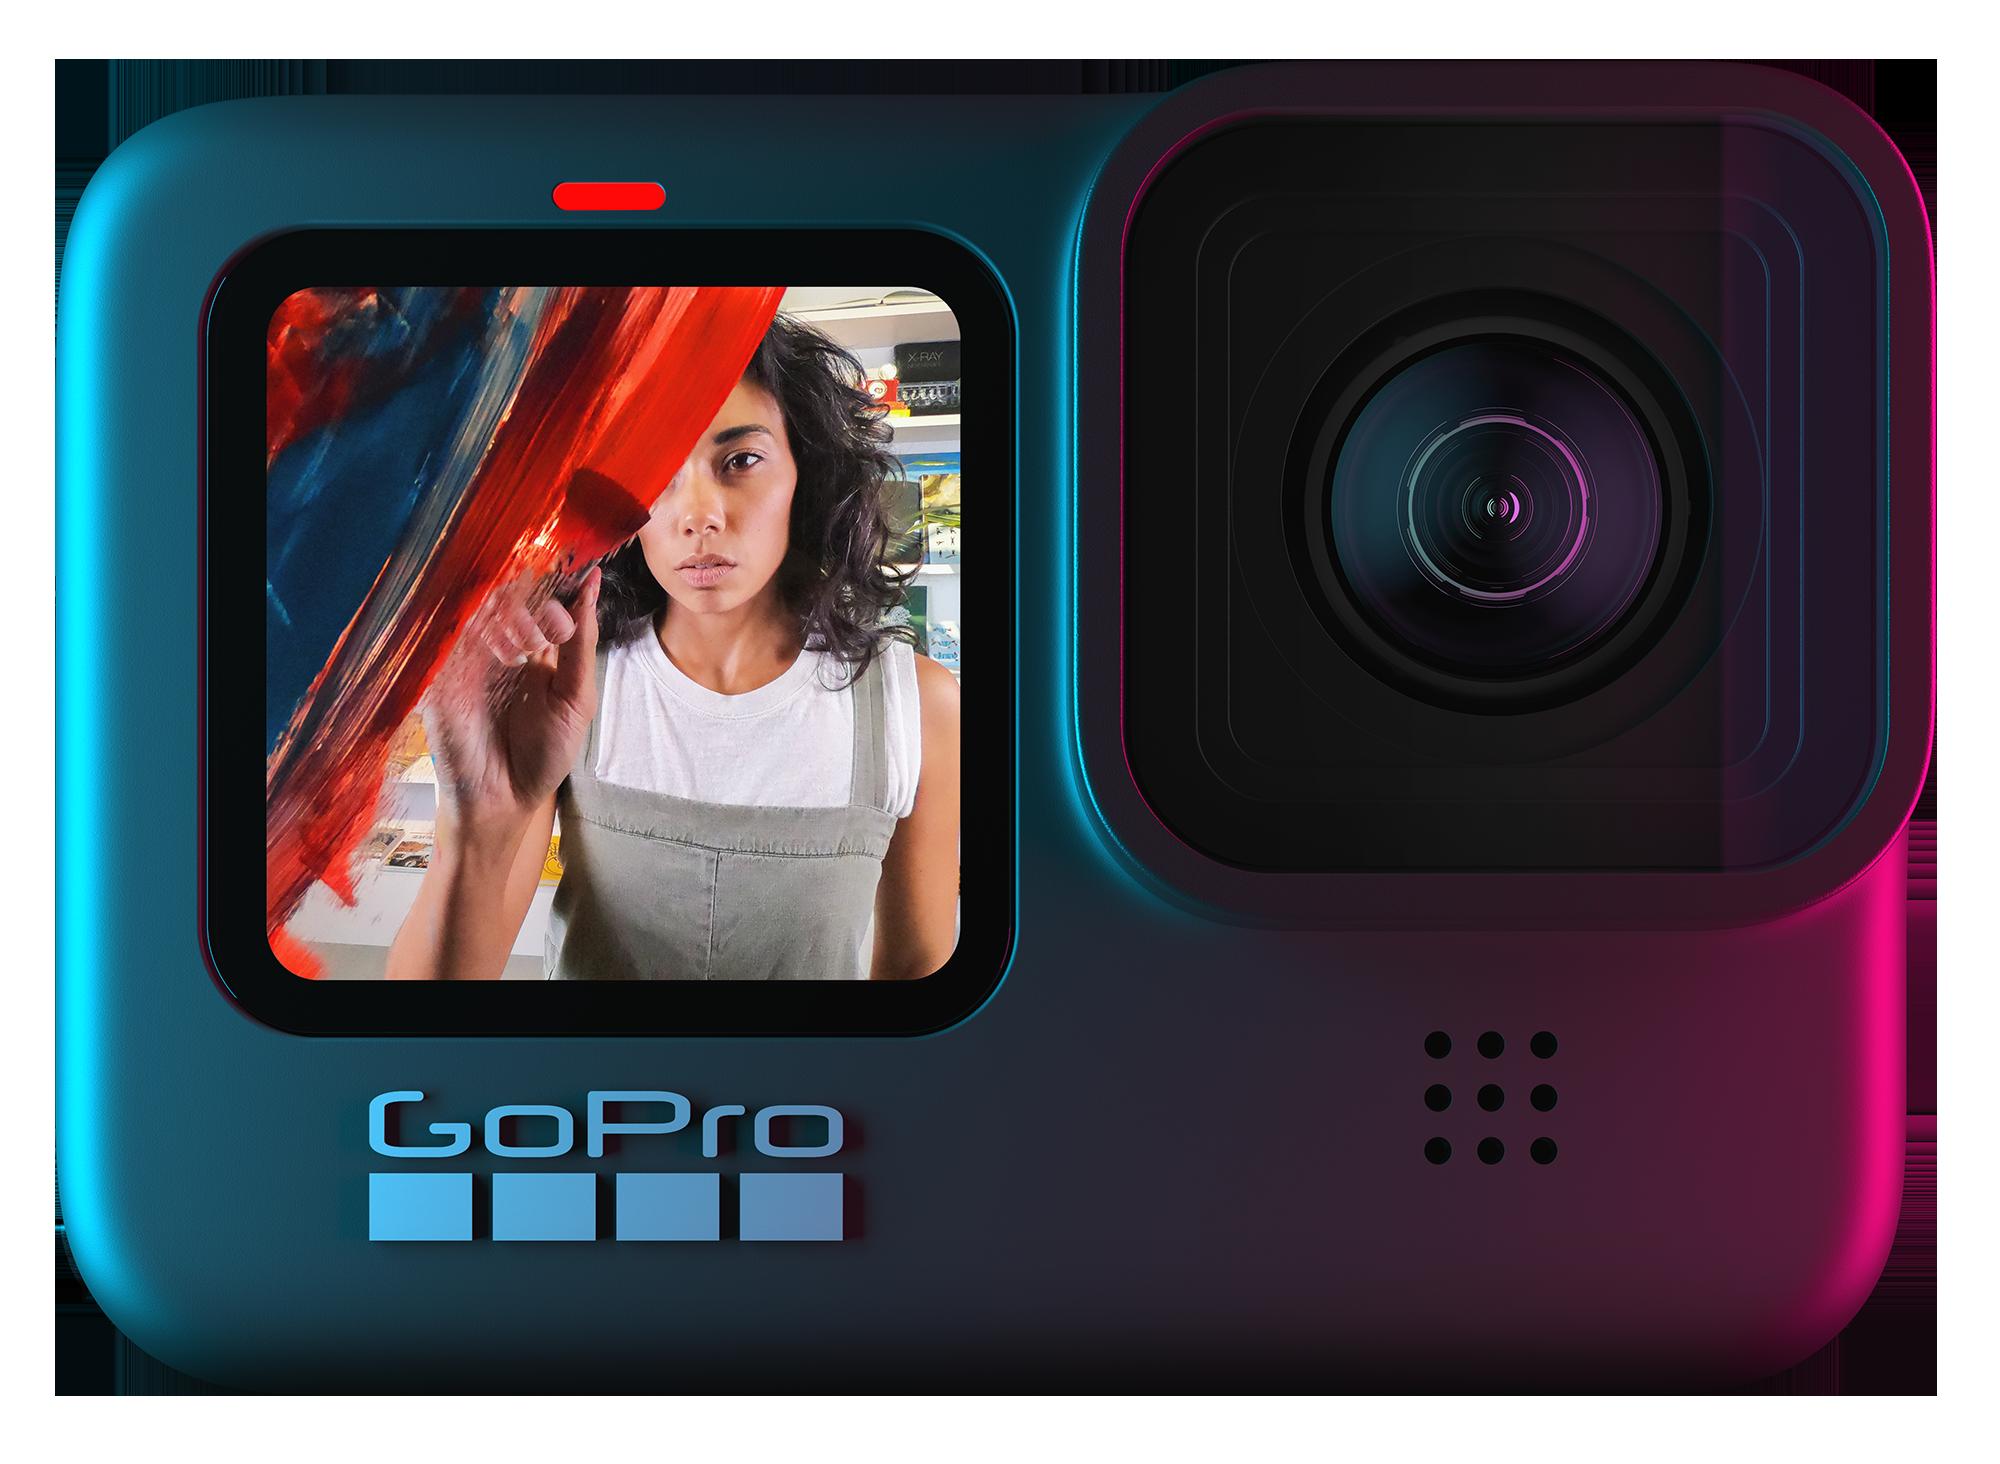 The HERO9 Black model from GoPro.